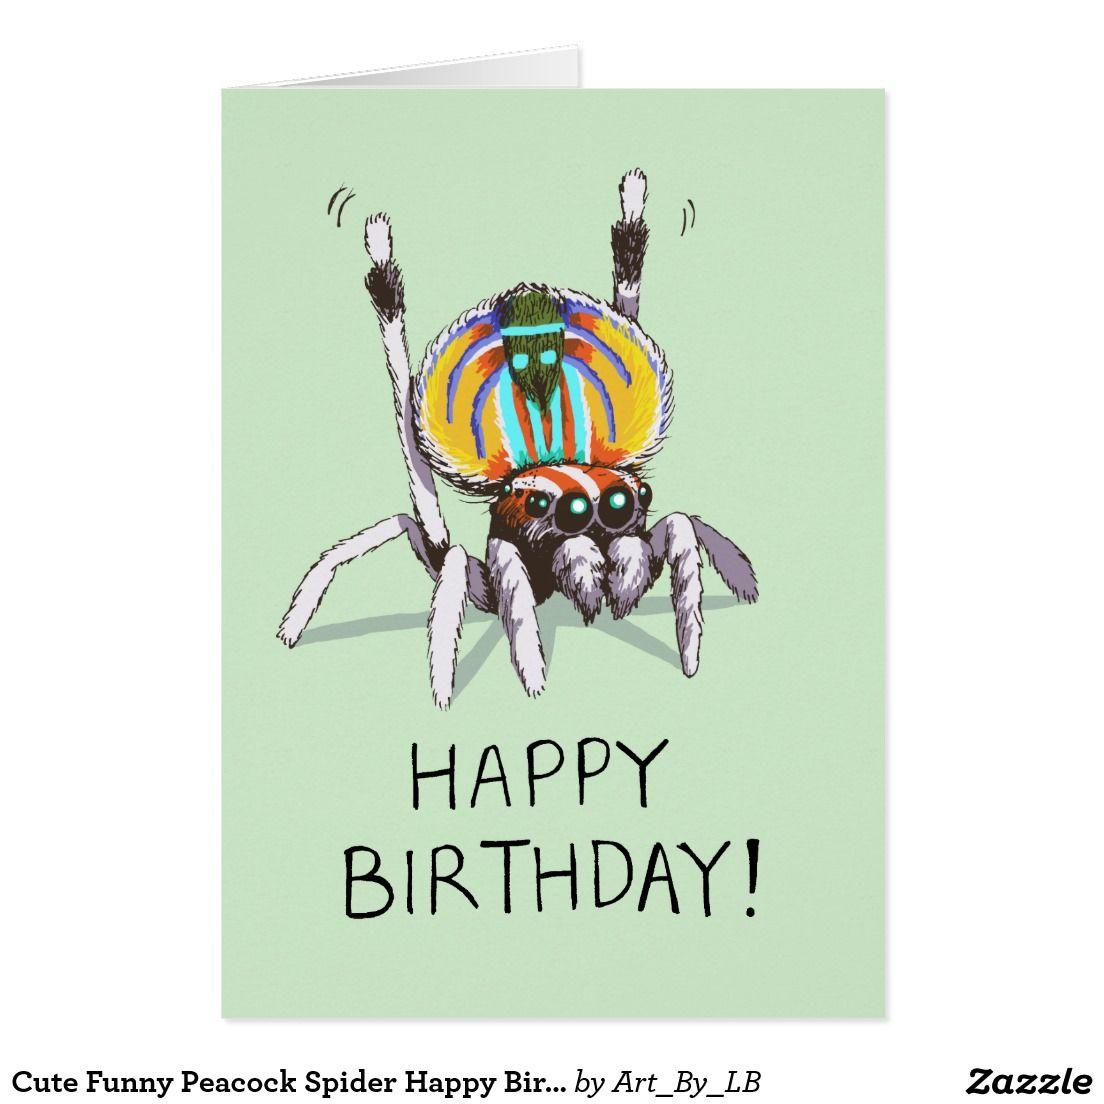 Cute funny peacock spider happy birthday card